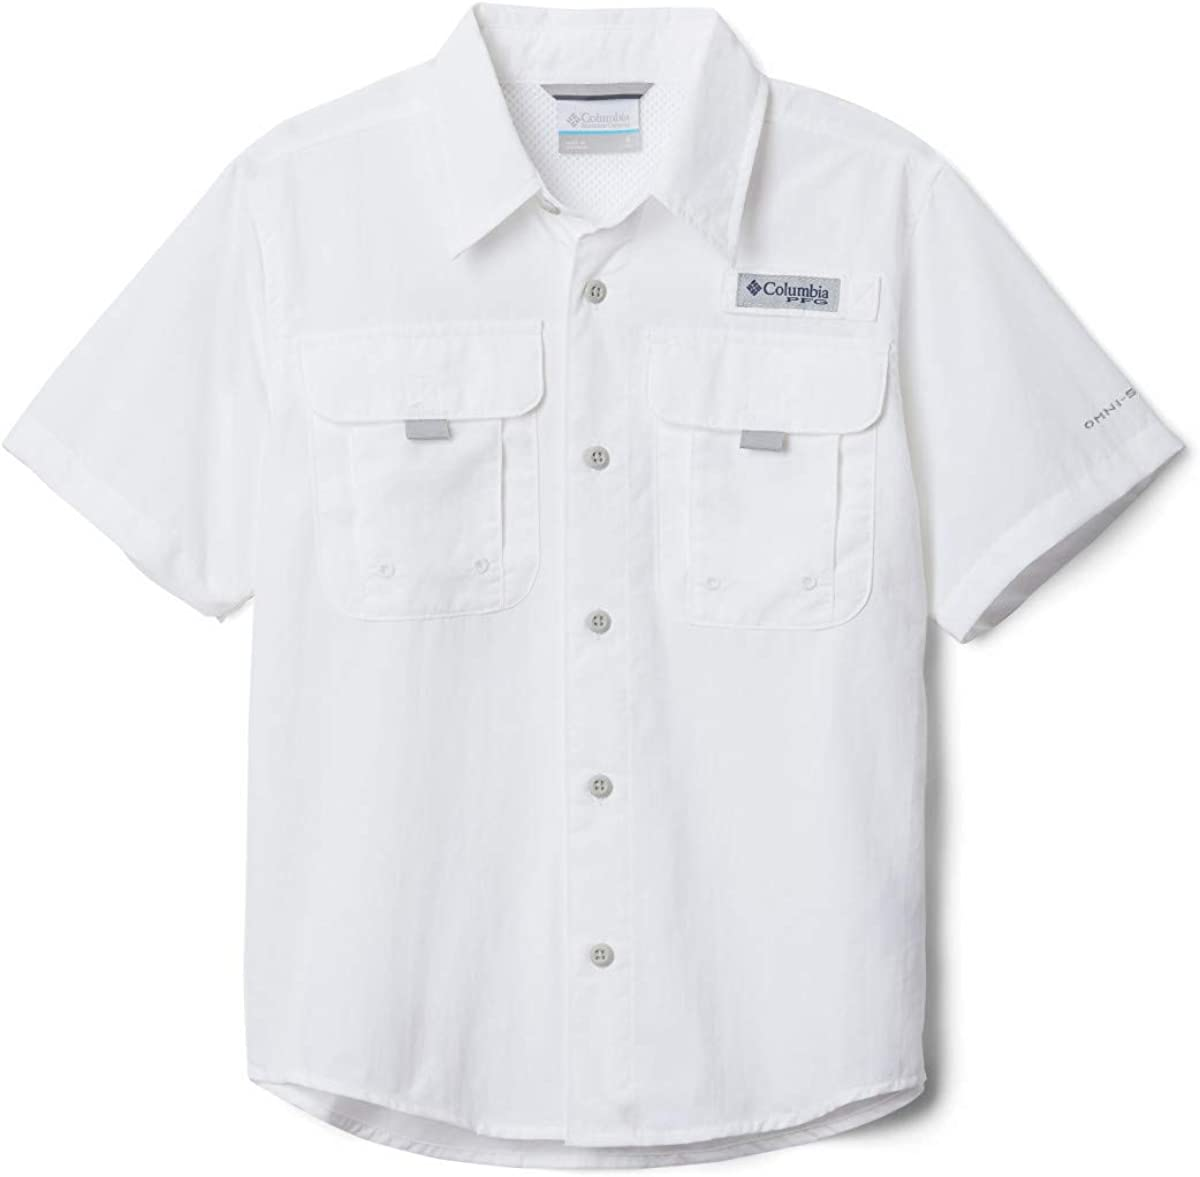 Columbia Youth Boys Bahama Short Sleeve Shirt